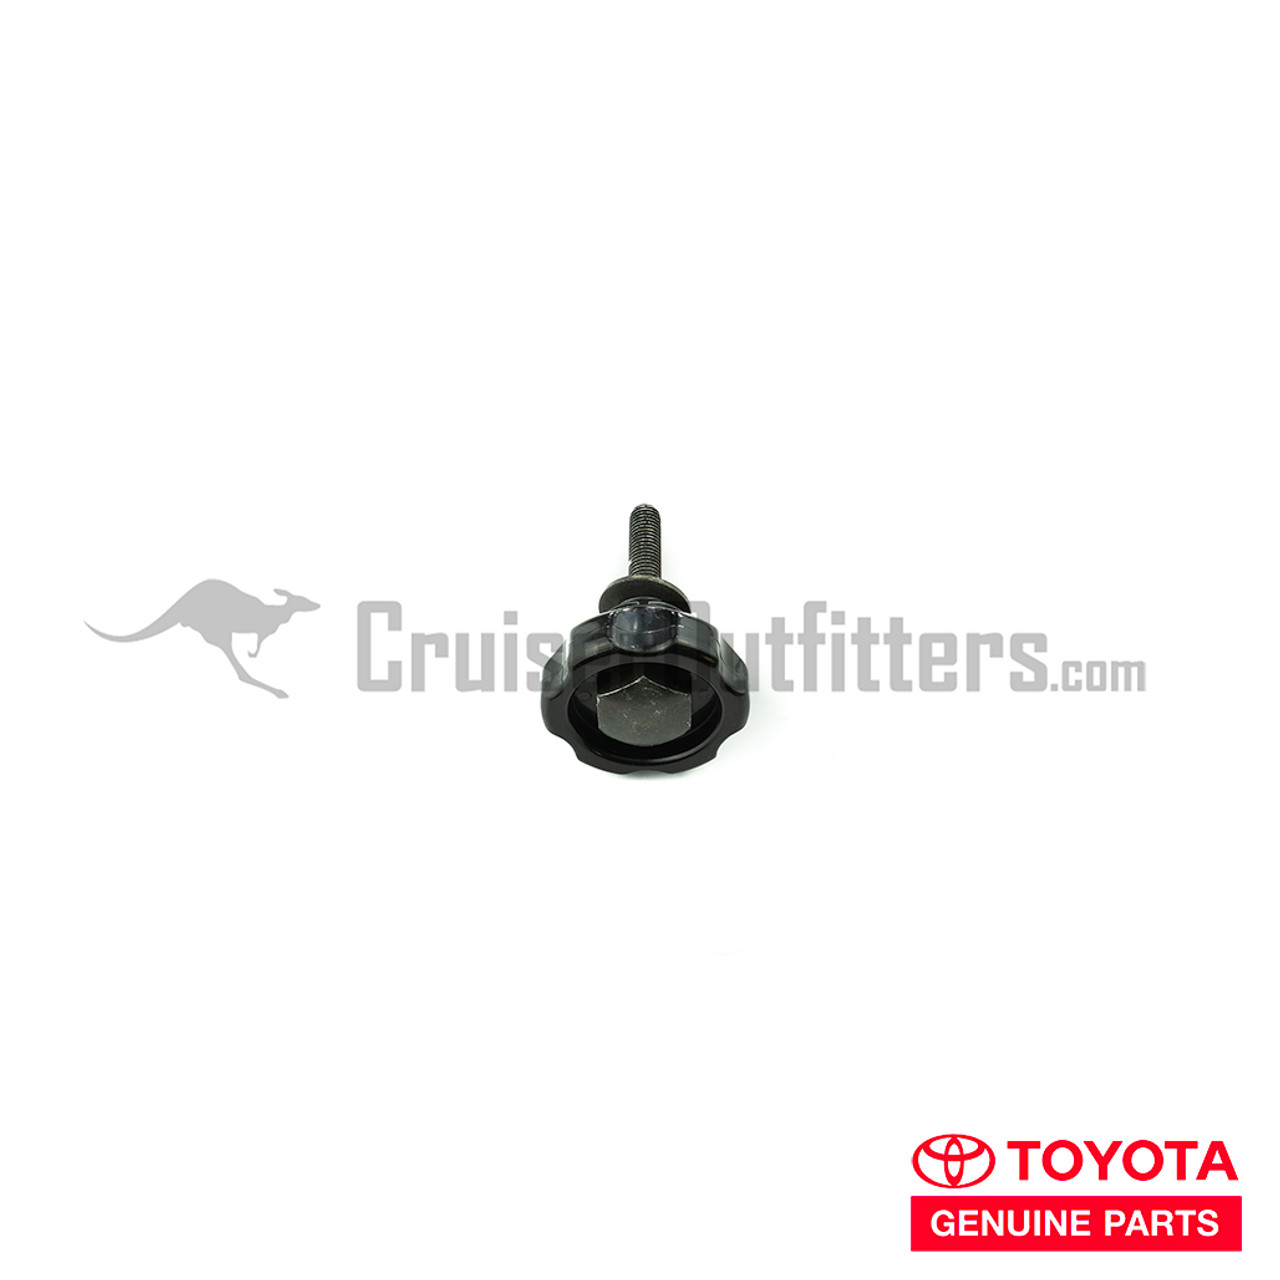 Windshield Fold Handle - OEM Toyota - Fits 7x Series (INT56453)